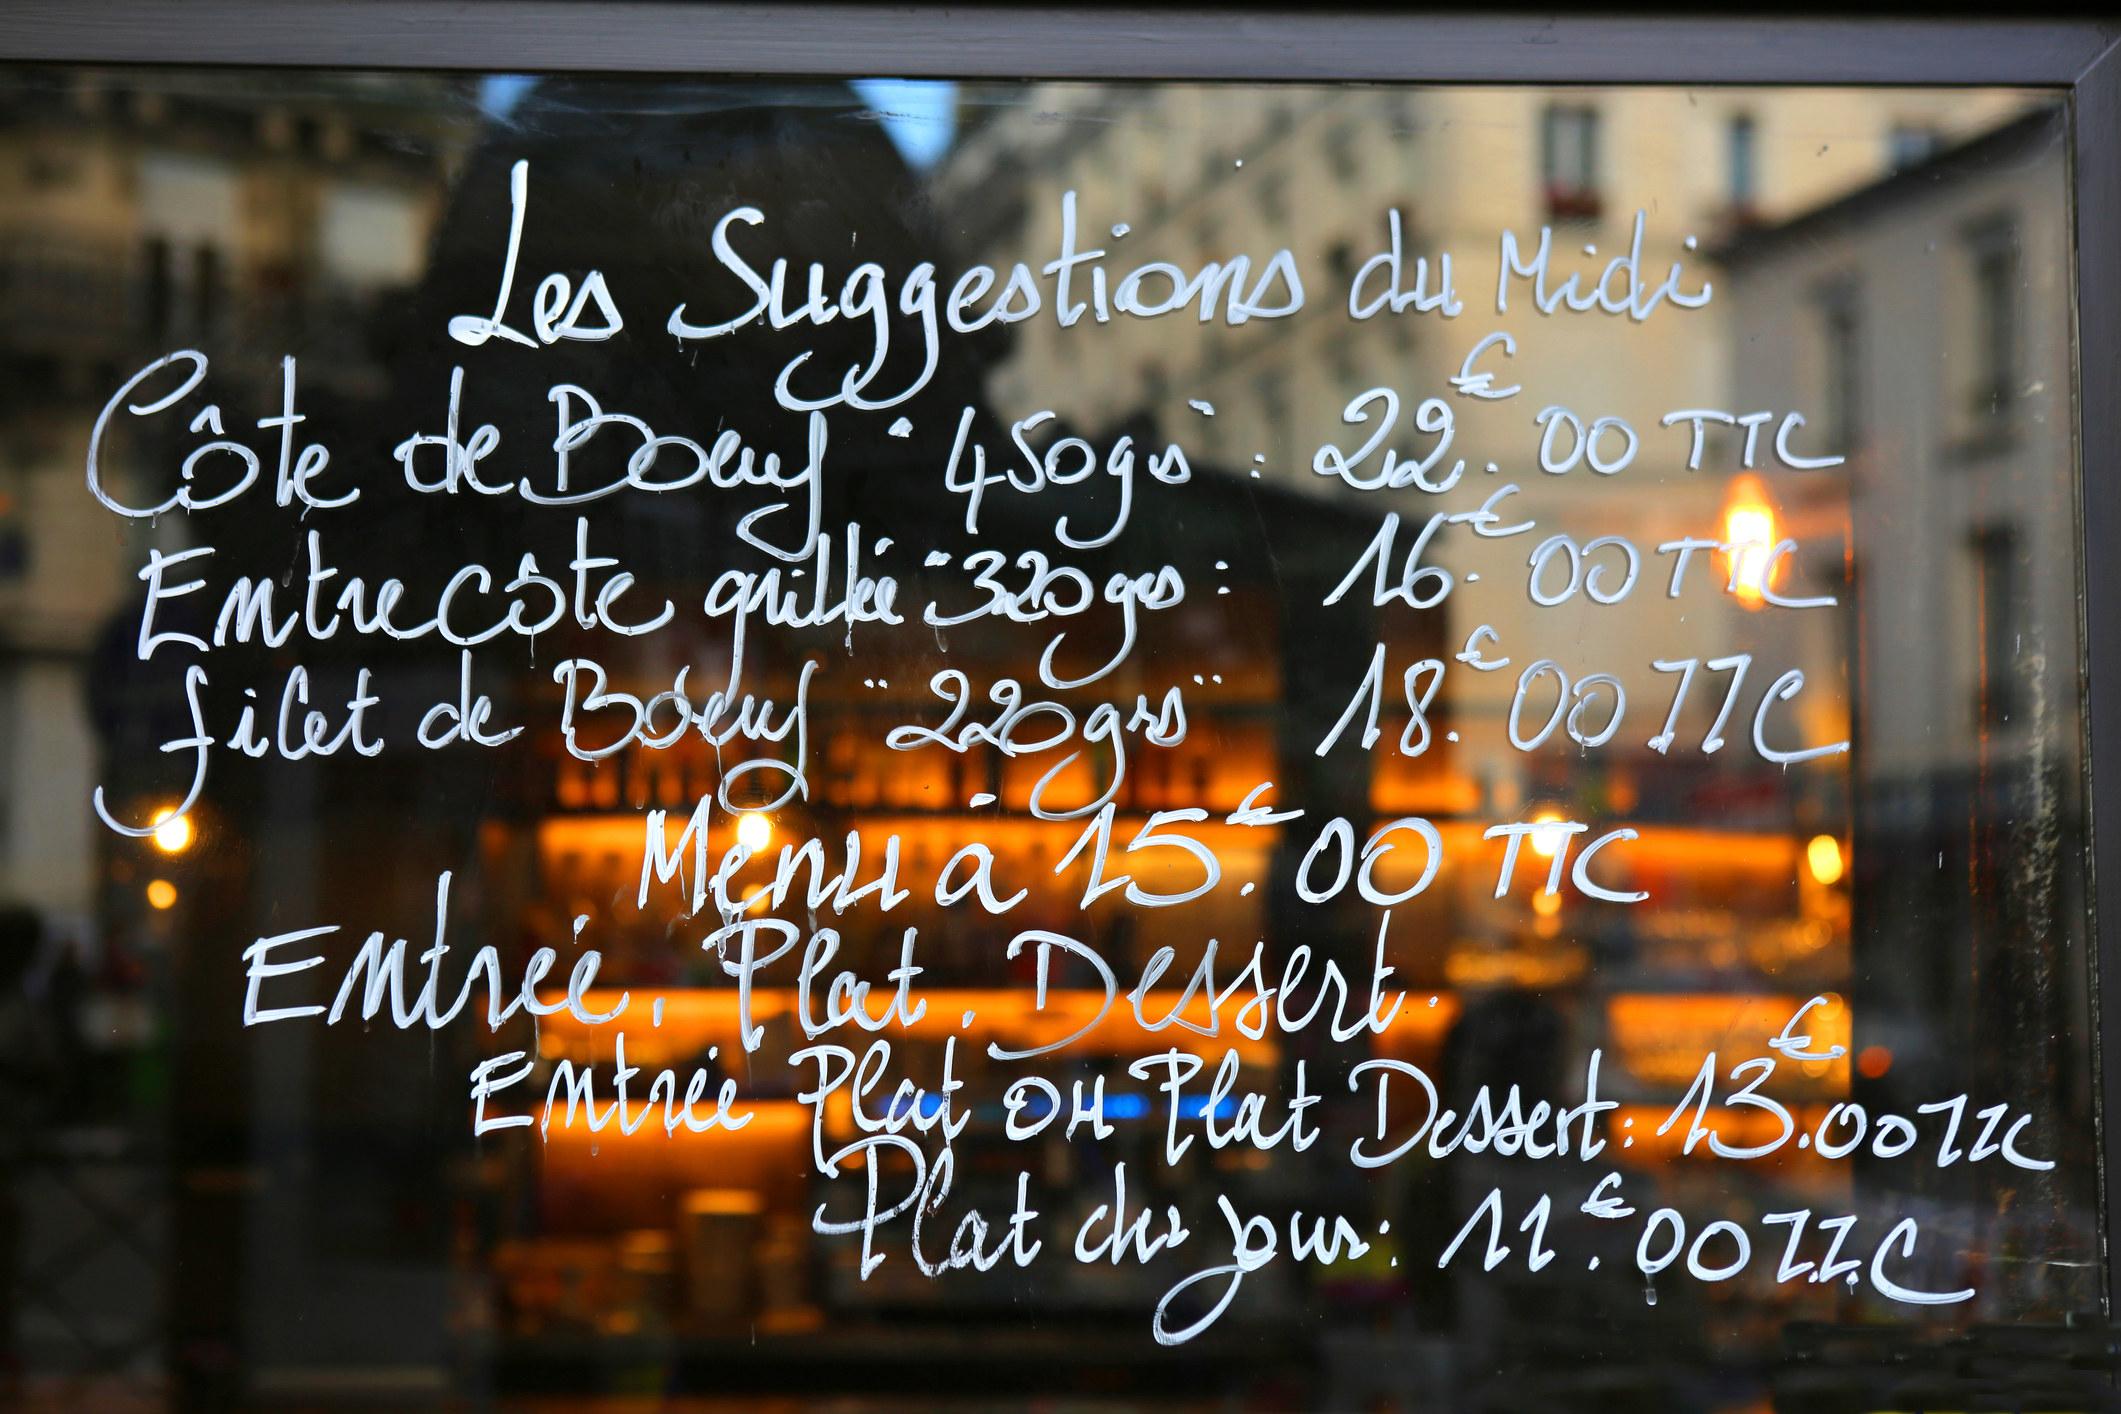 A menu written in French.